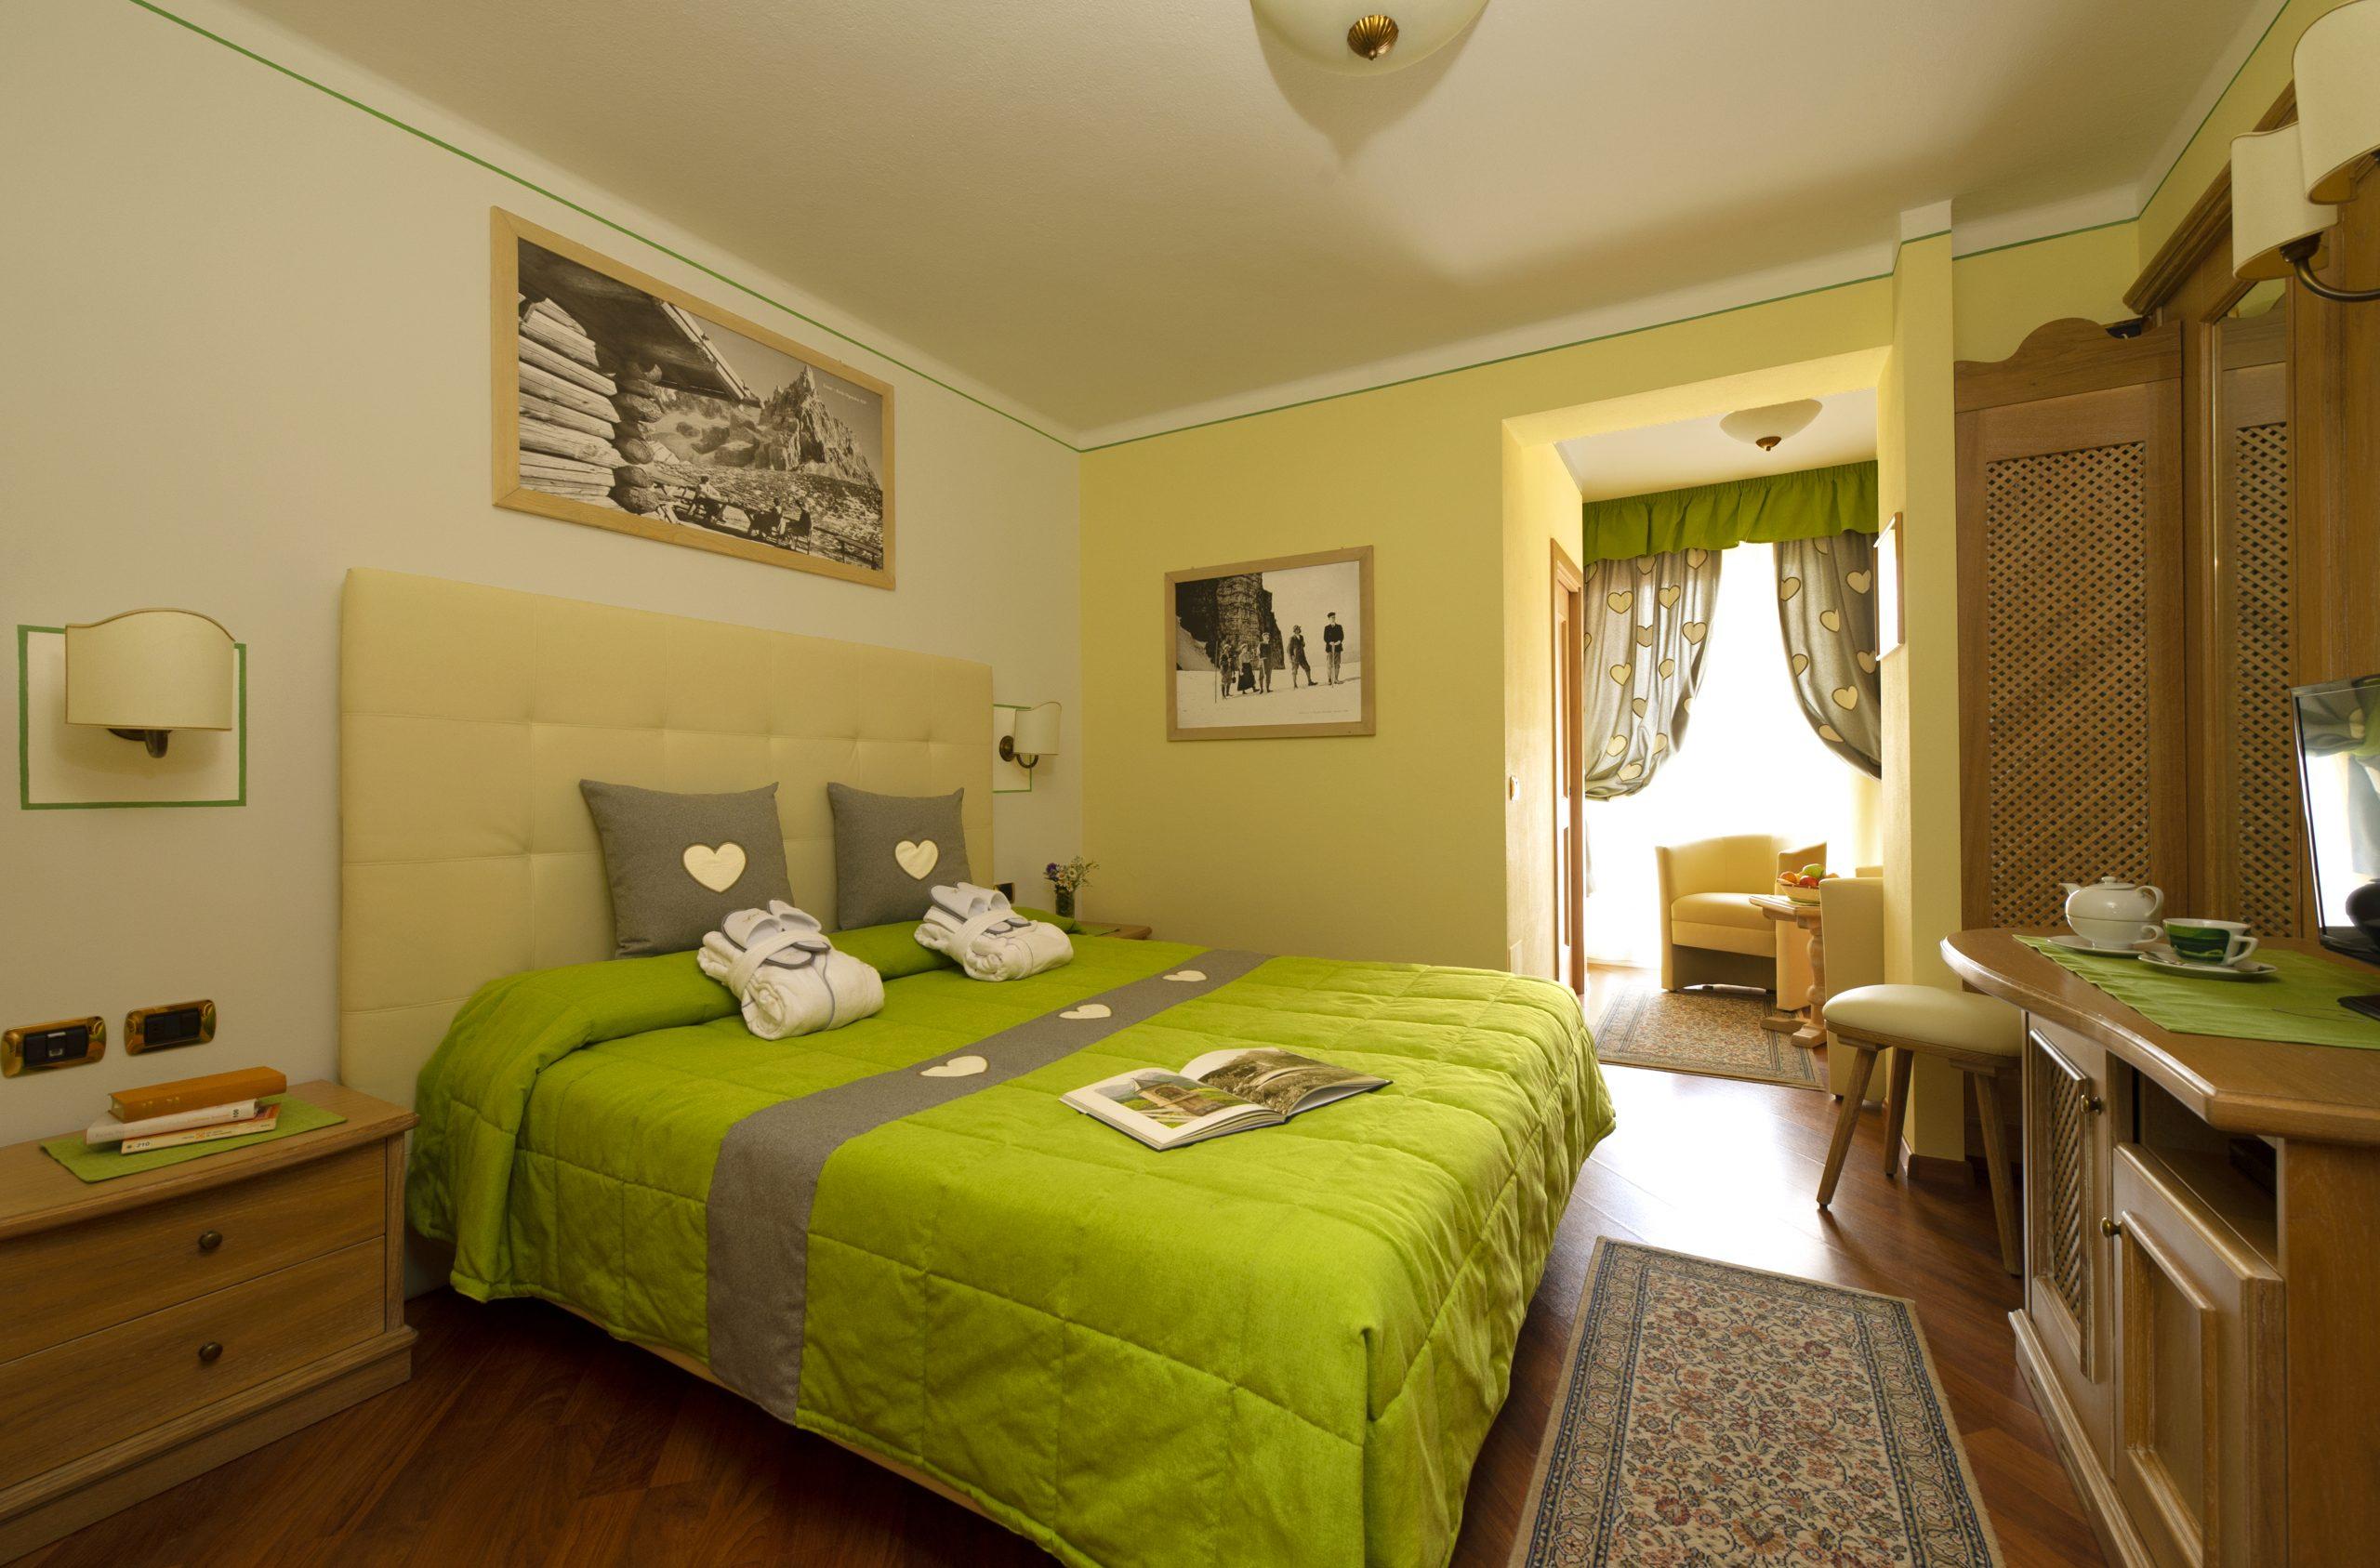 camere in val di Fassa a Moena, Hotel 4 stelle Val di Fassa, Camera Relax, Camera Comfort, Family Room, Camera Singola